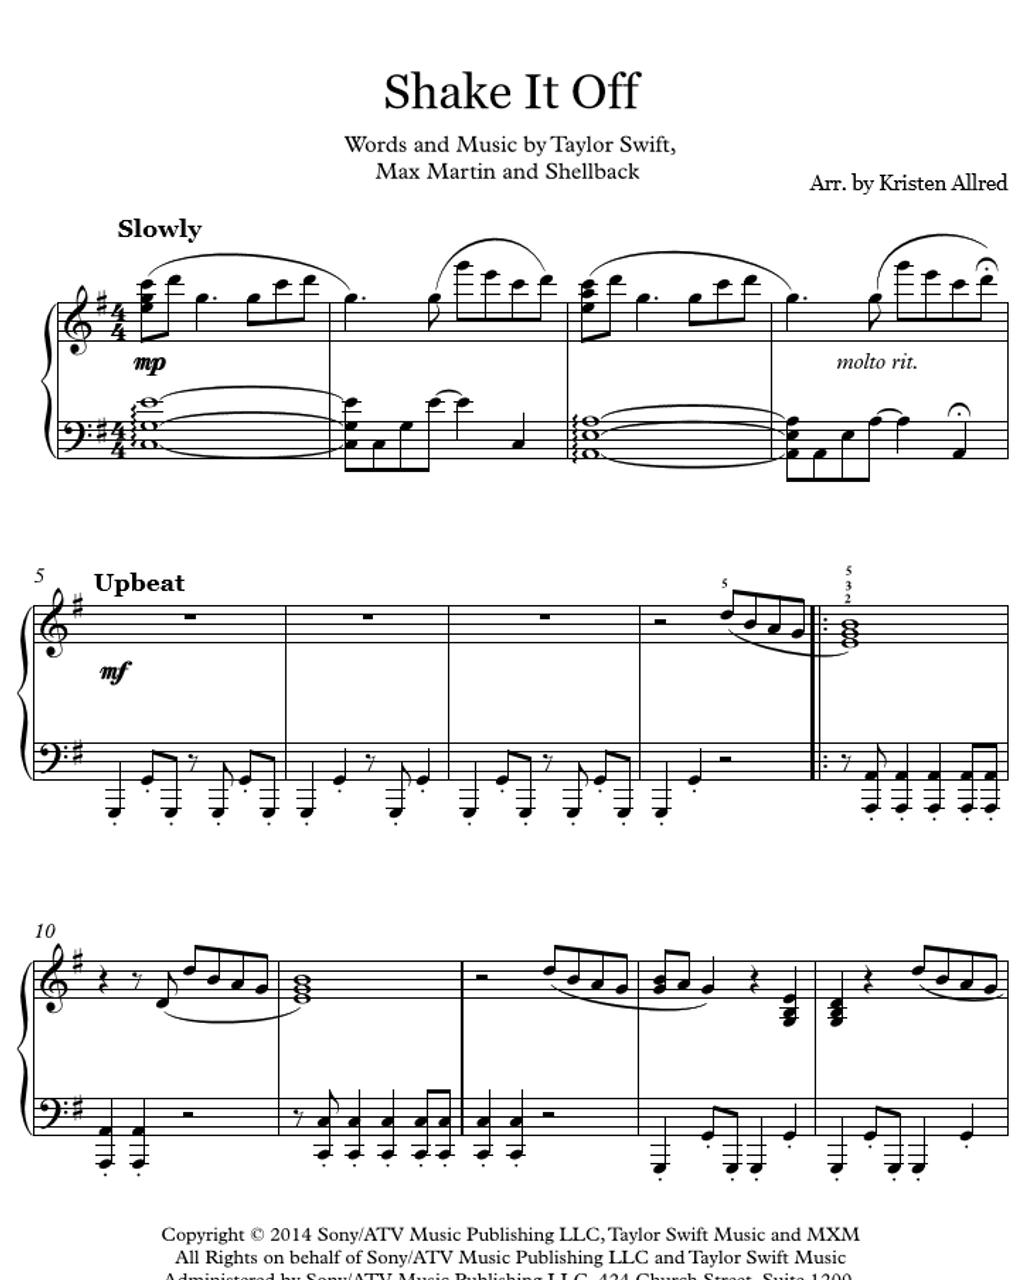 Piano piano sheet music stay rihanna : Stay by Rihanna and Mikky Ekko- Easy Piano Sheet Music Download